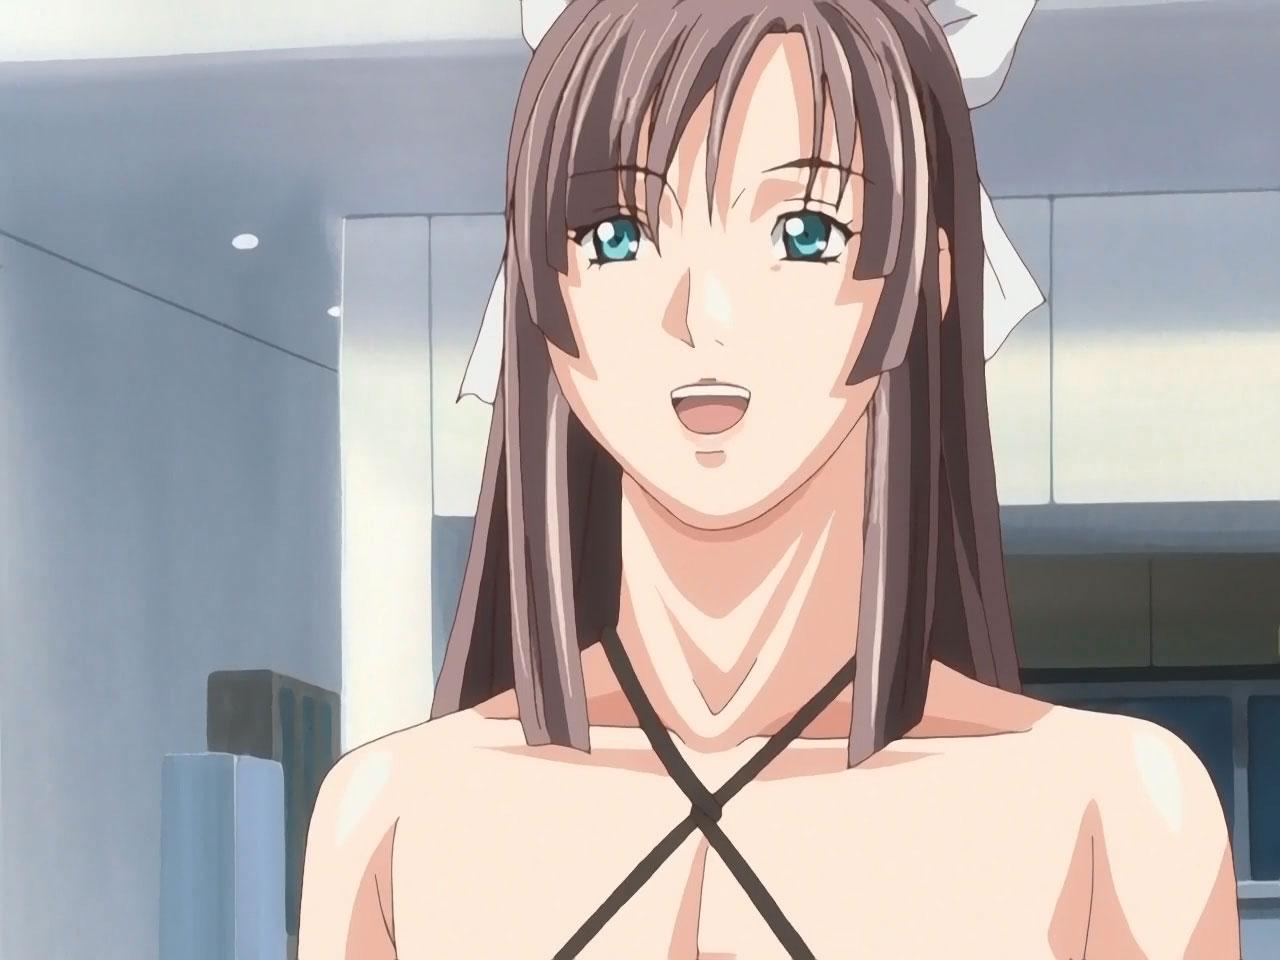 cleavage anime